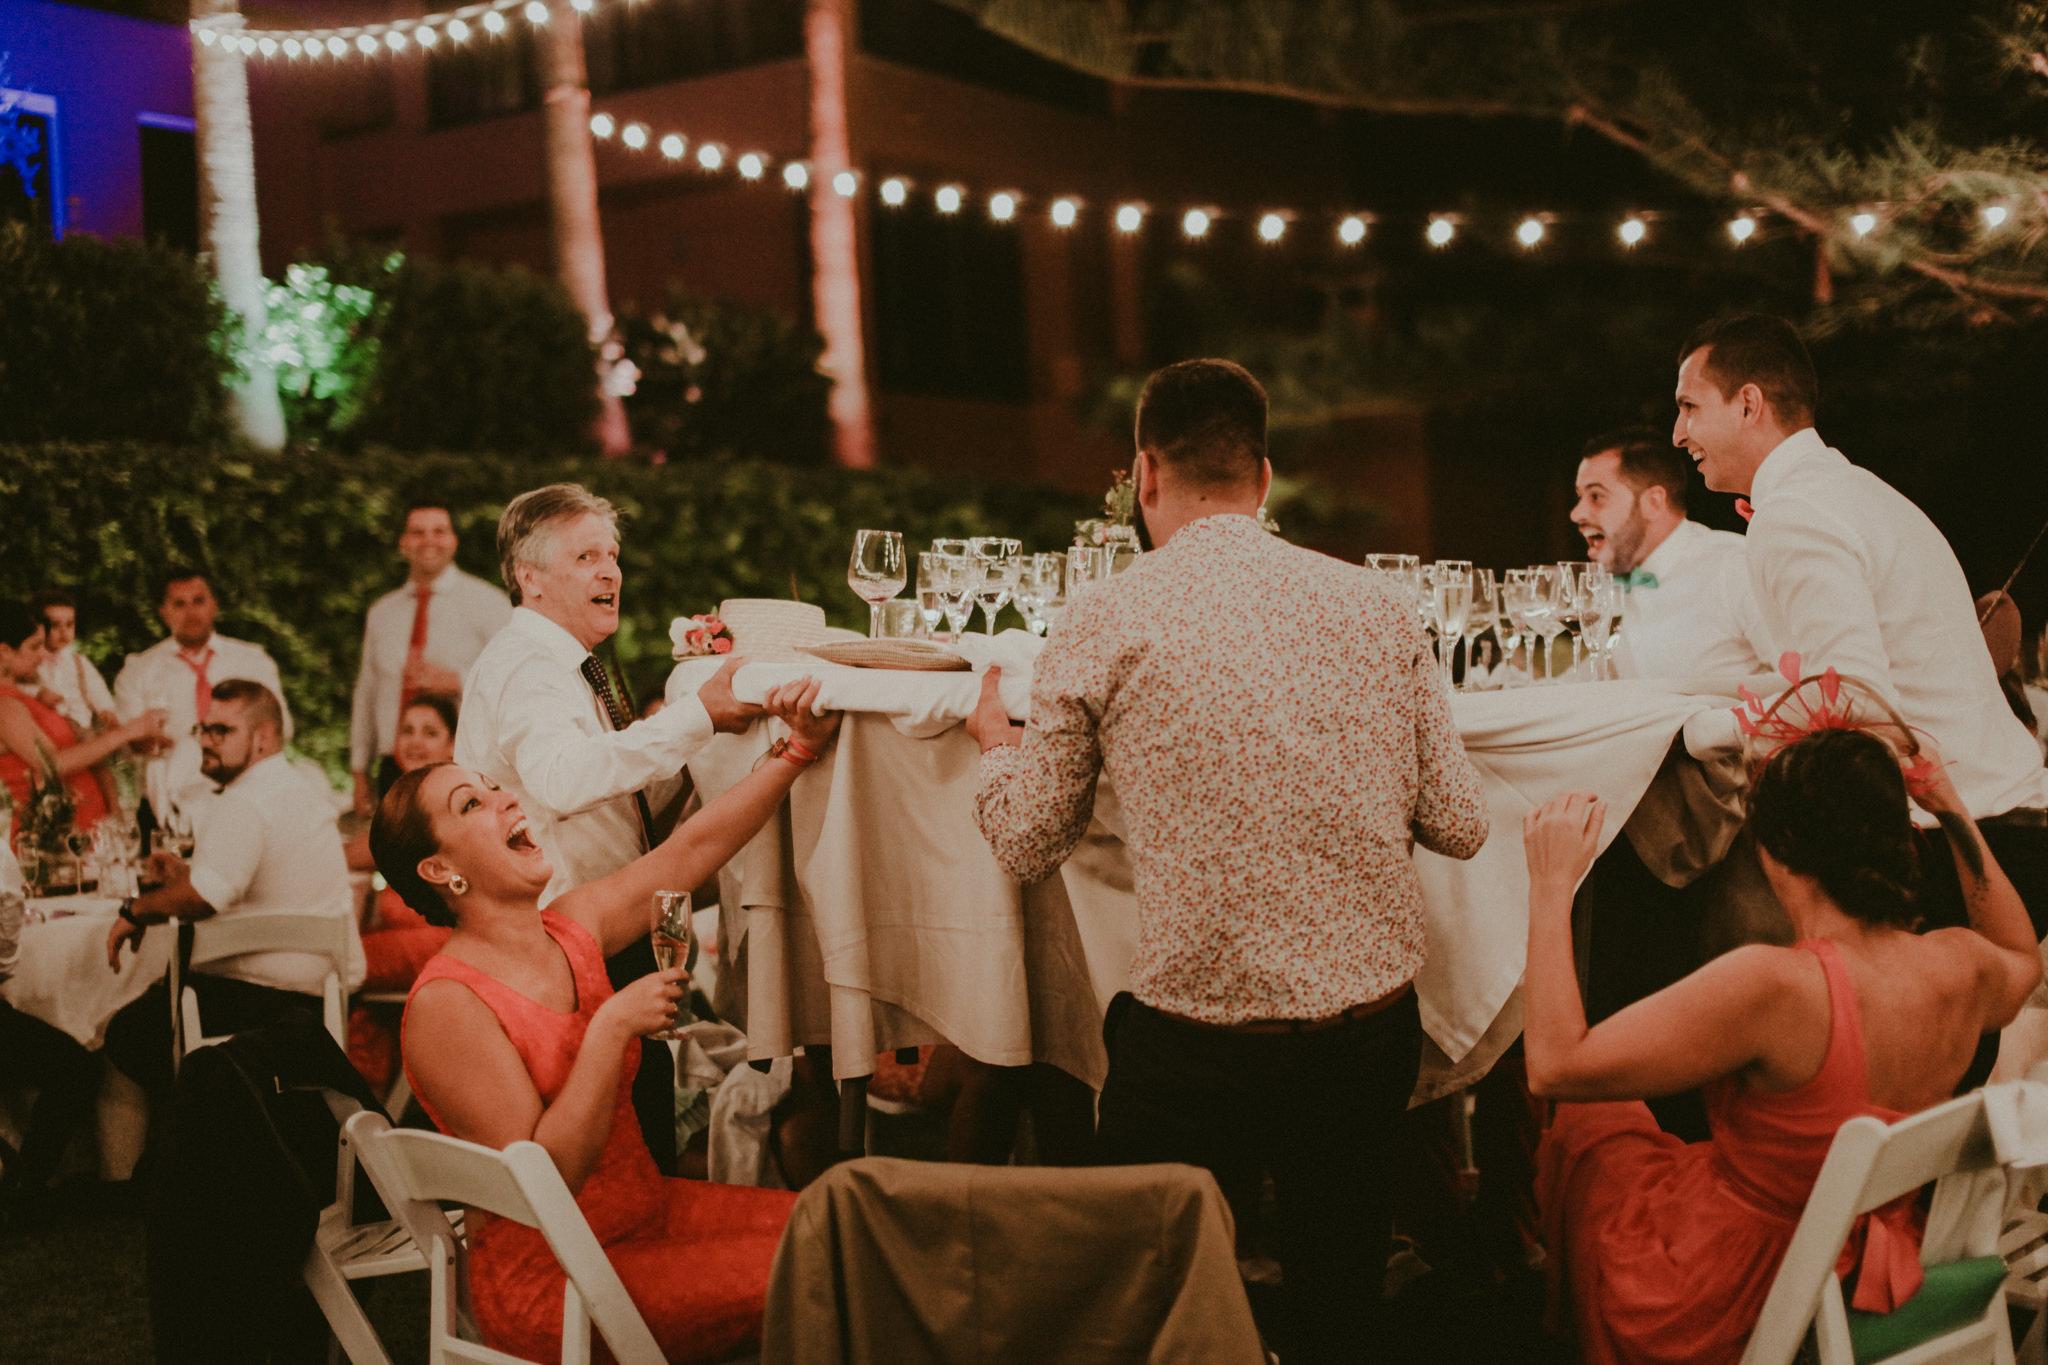 boda-diferente-fotografo-boda-laspalmas-grancanaria-80